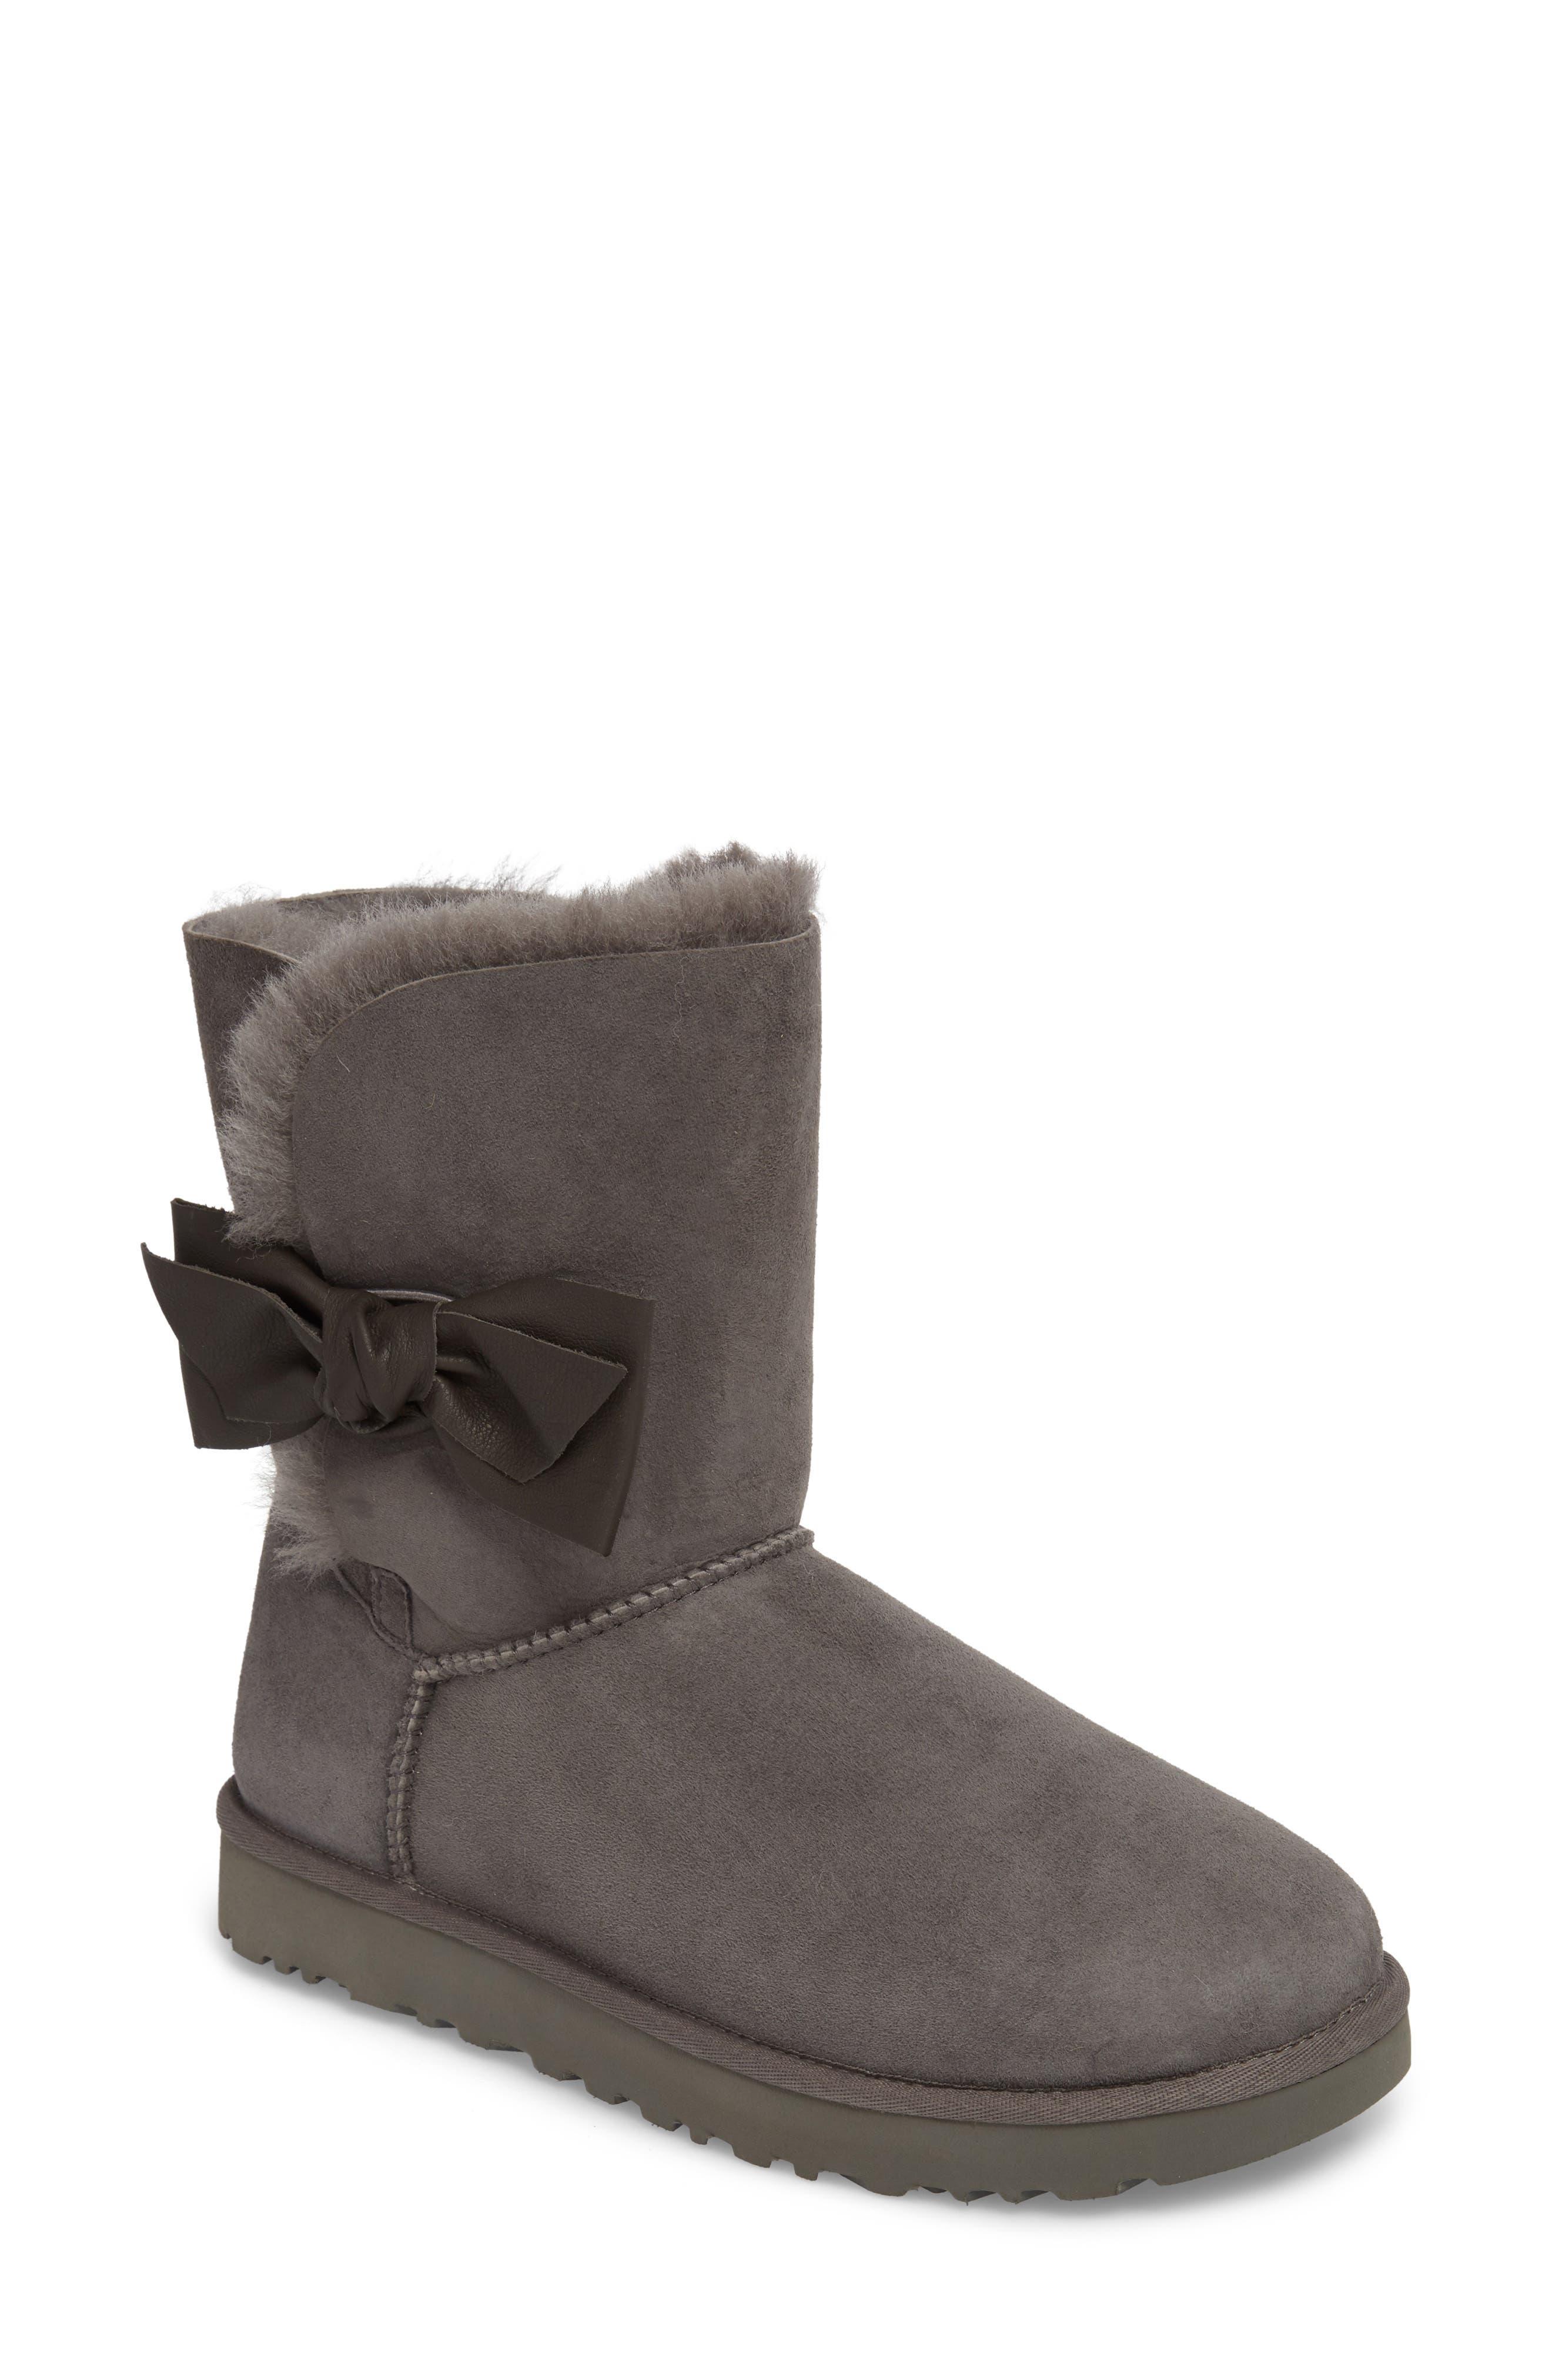 Ugg Daelynn Boot, Grey